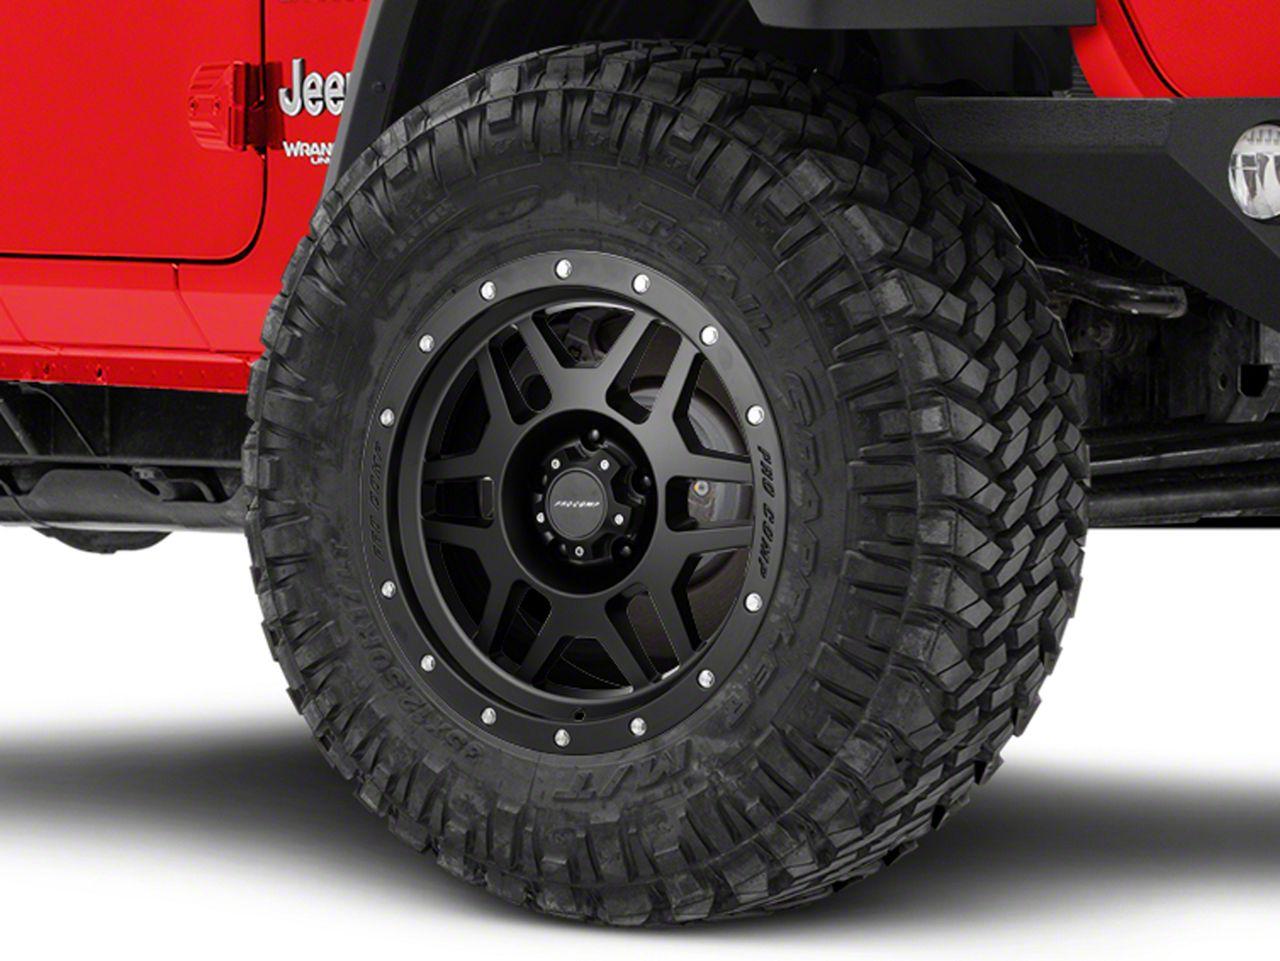 Pro Comp Wheels Alloy Series 41 Phaser Satin Black Wheel - 18x9 (18-19 Jeep Wrangler JL)